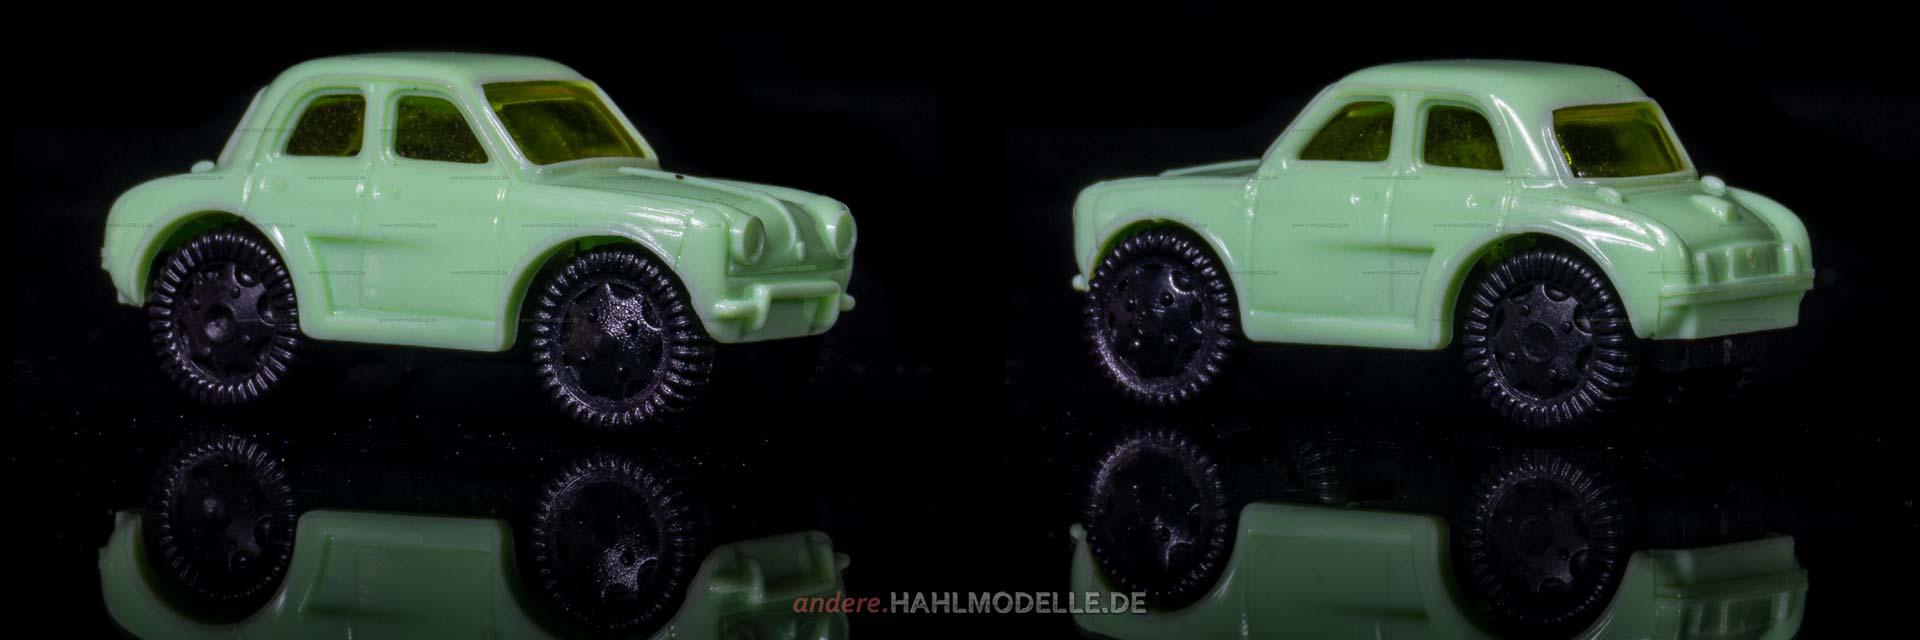 Renault Dauphine | Limousine | Ferrero Überraschungsei | www.andere.hahlmodelle.de